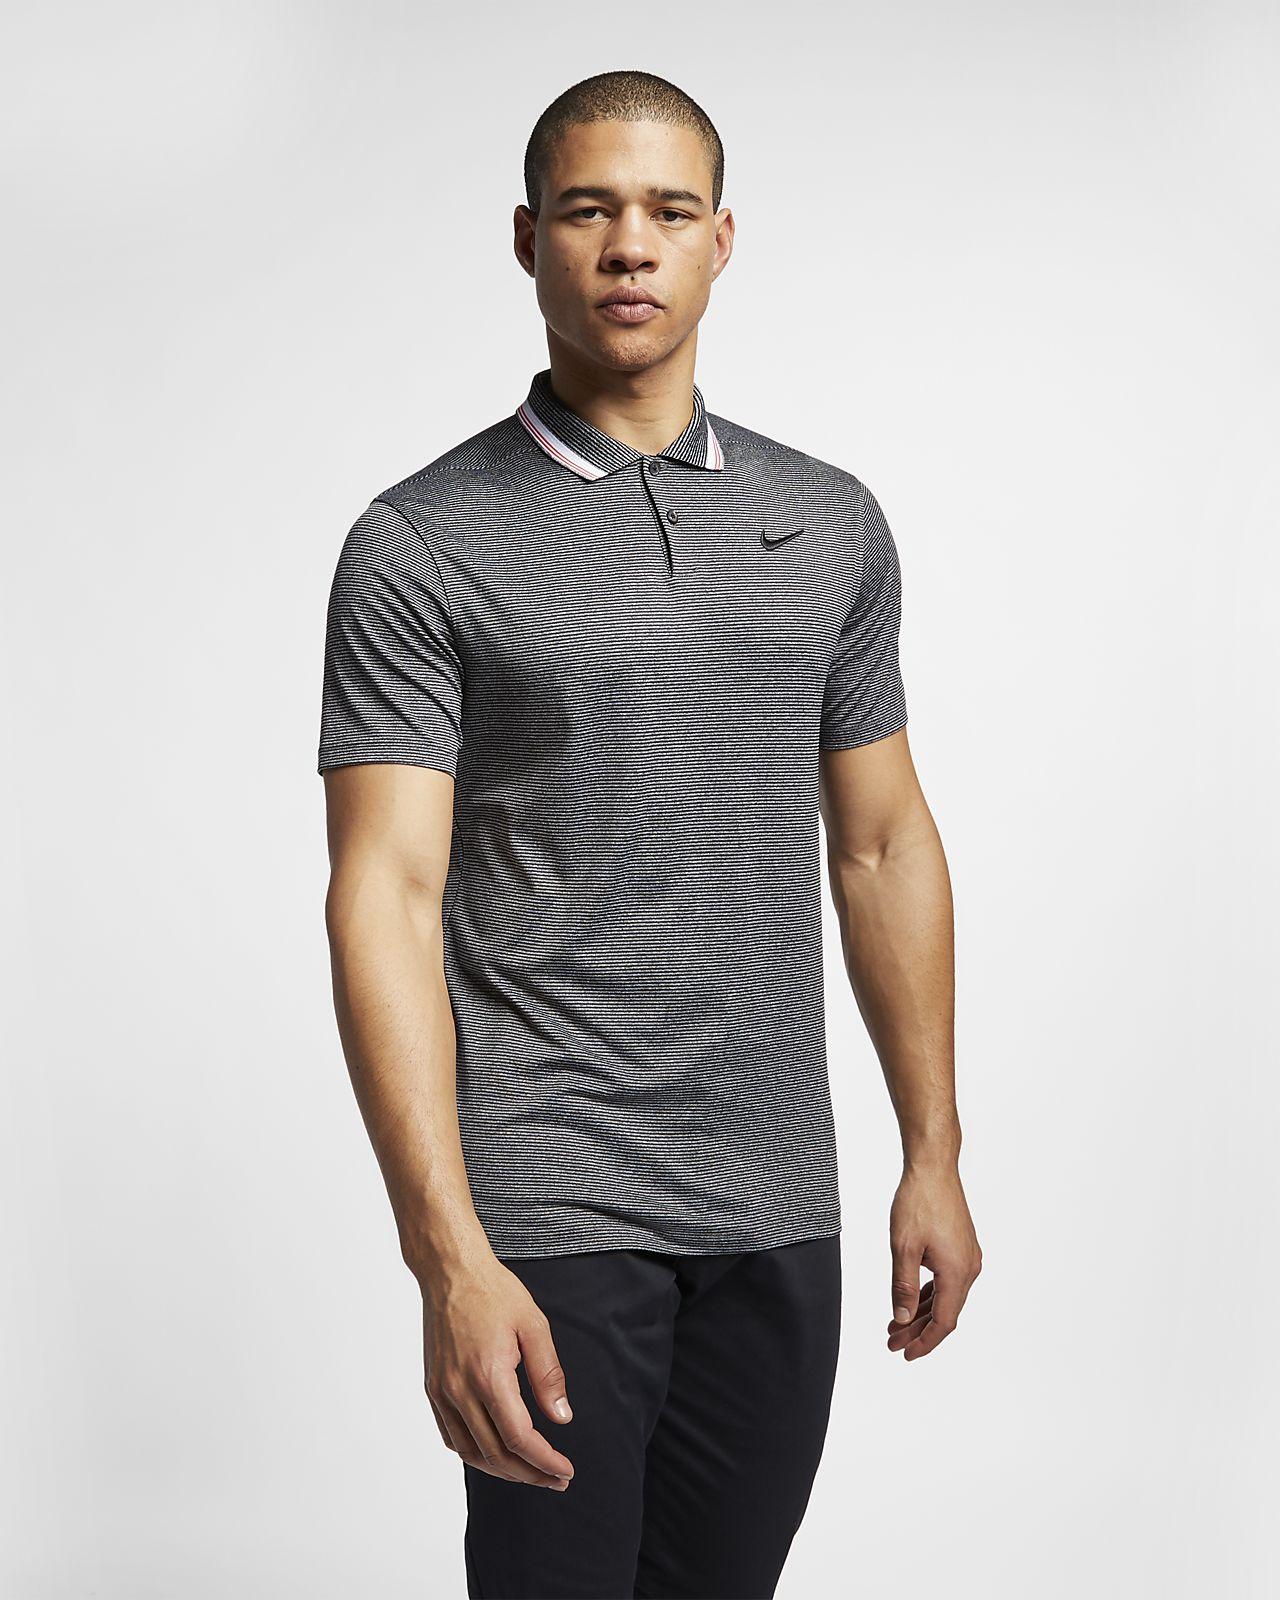 23ba6b7c Nike Dri-FIT Vapor Men's Golf Polo. Nike.com GB